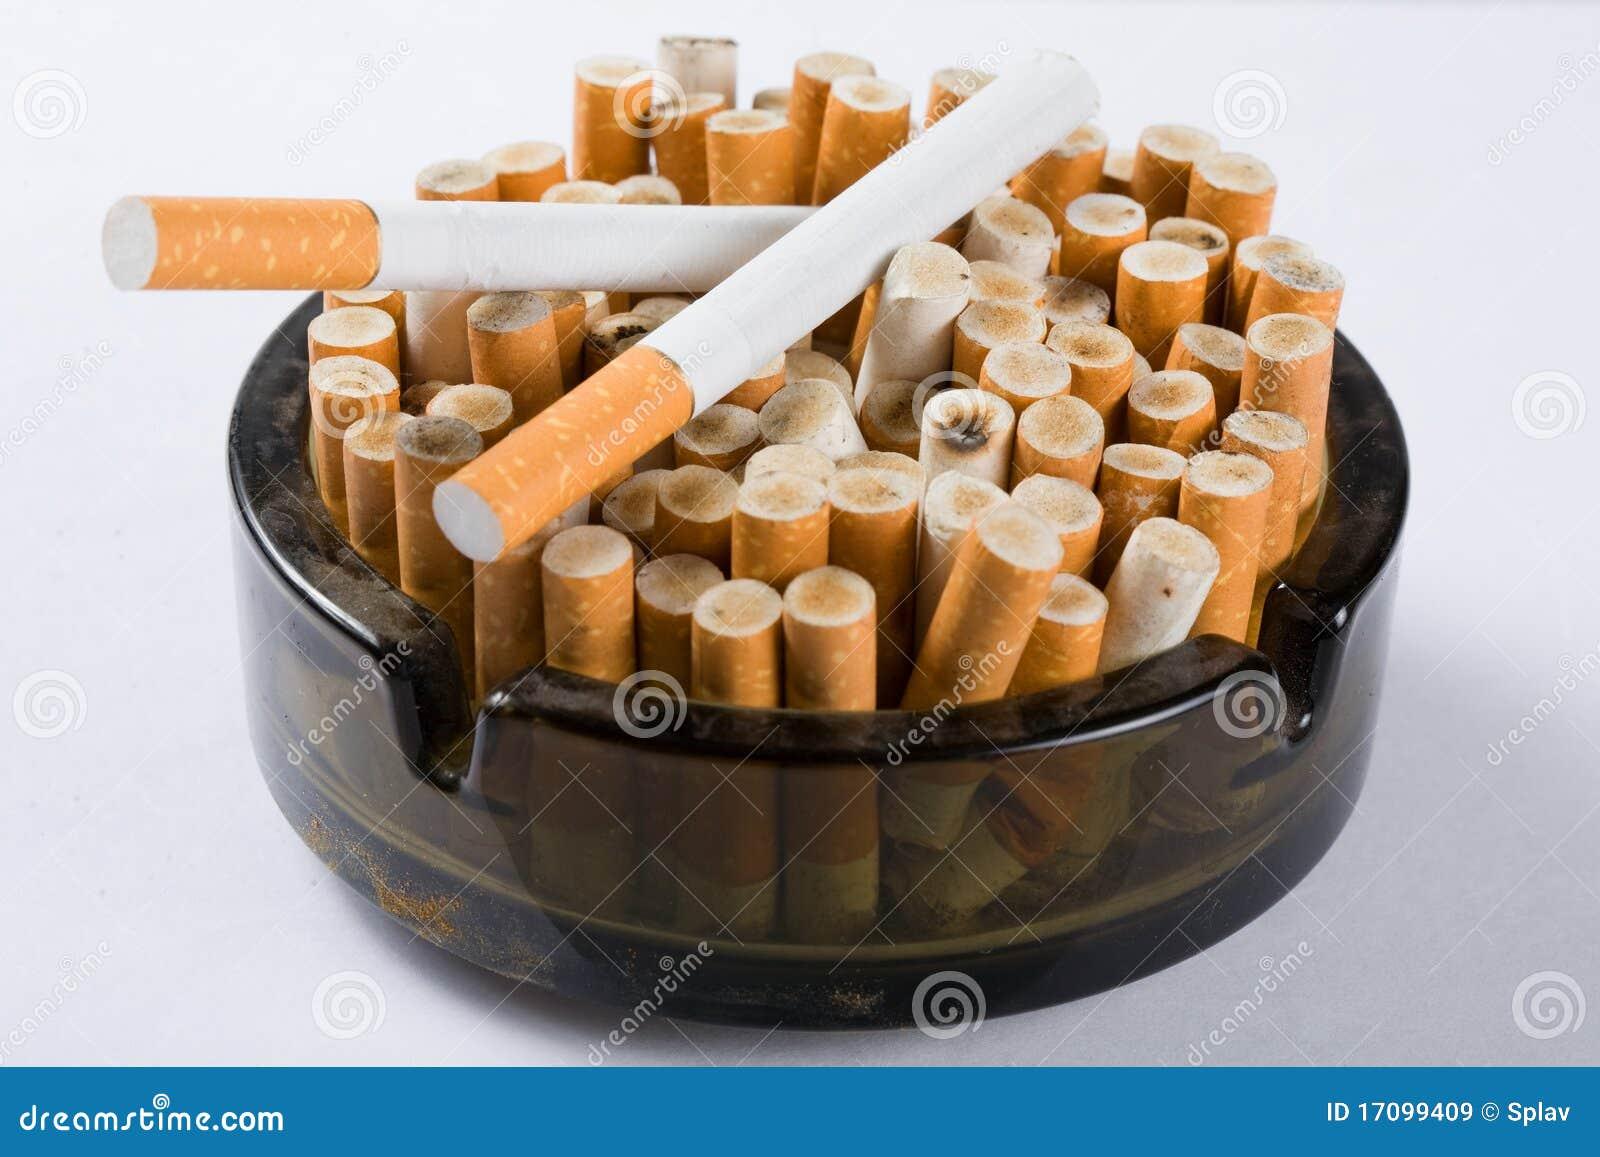 Сигареты в Ashtray